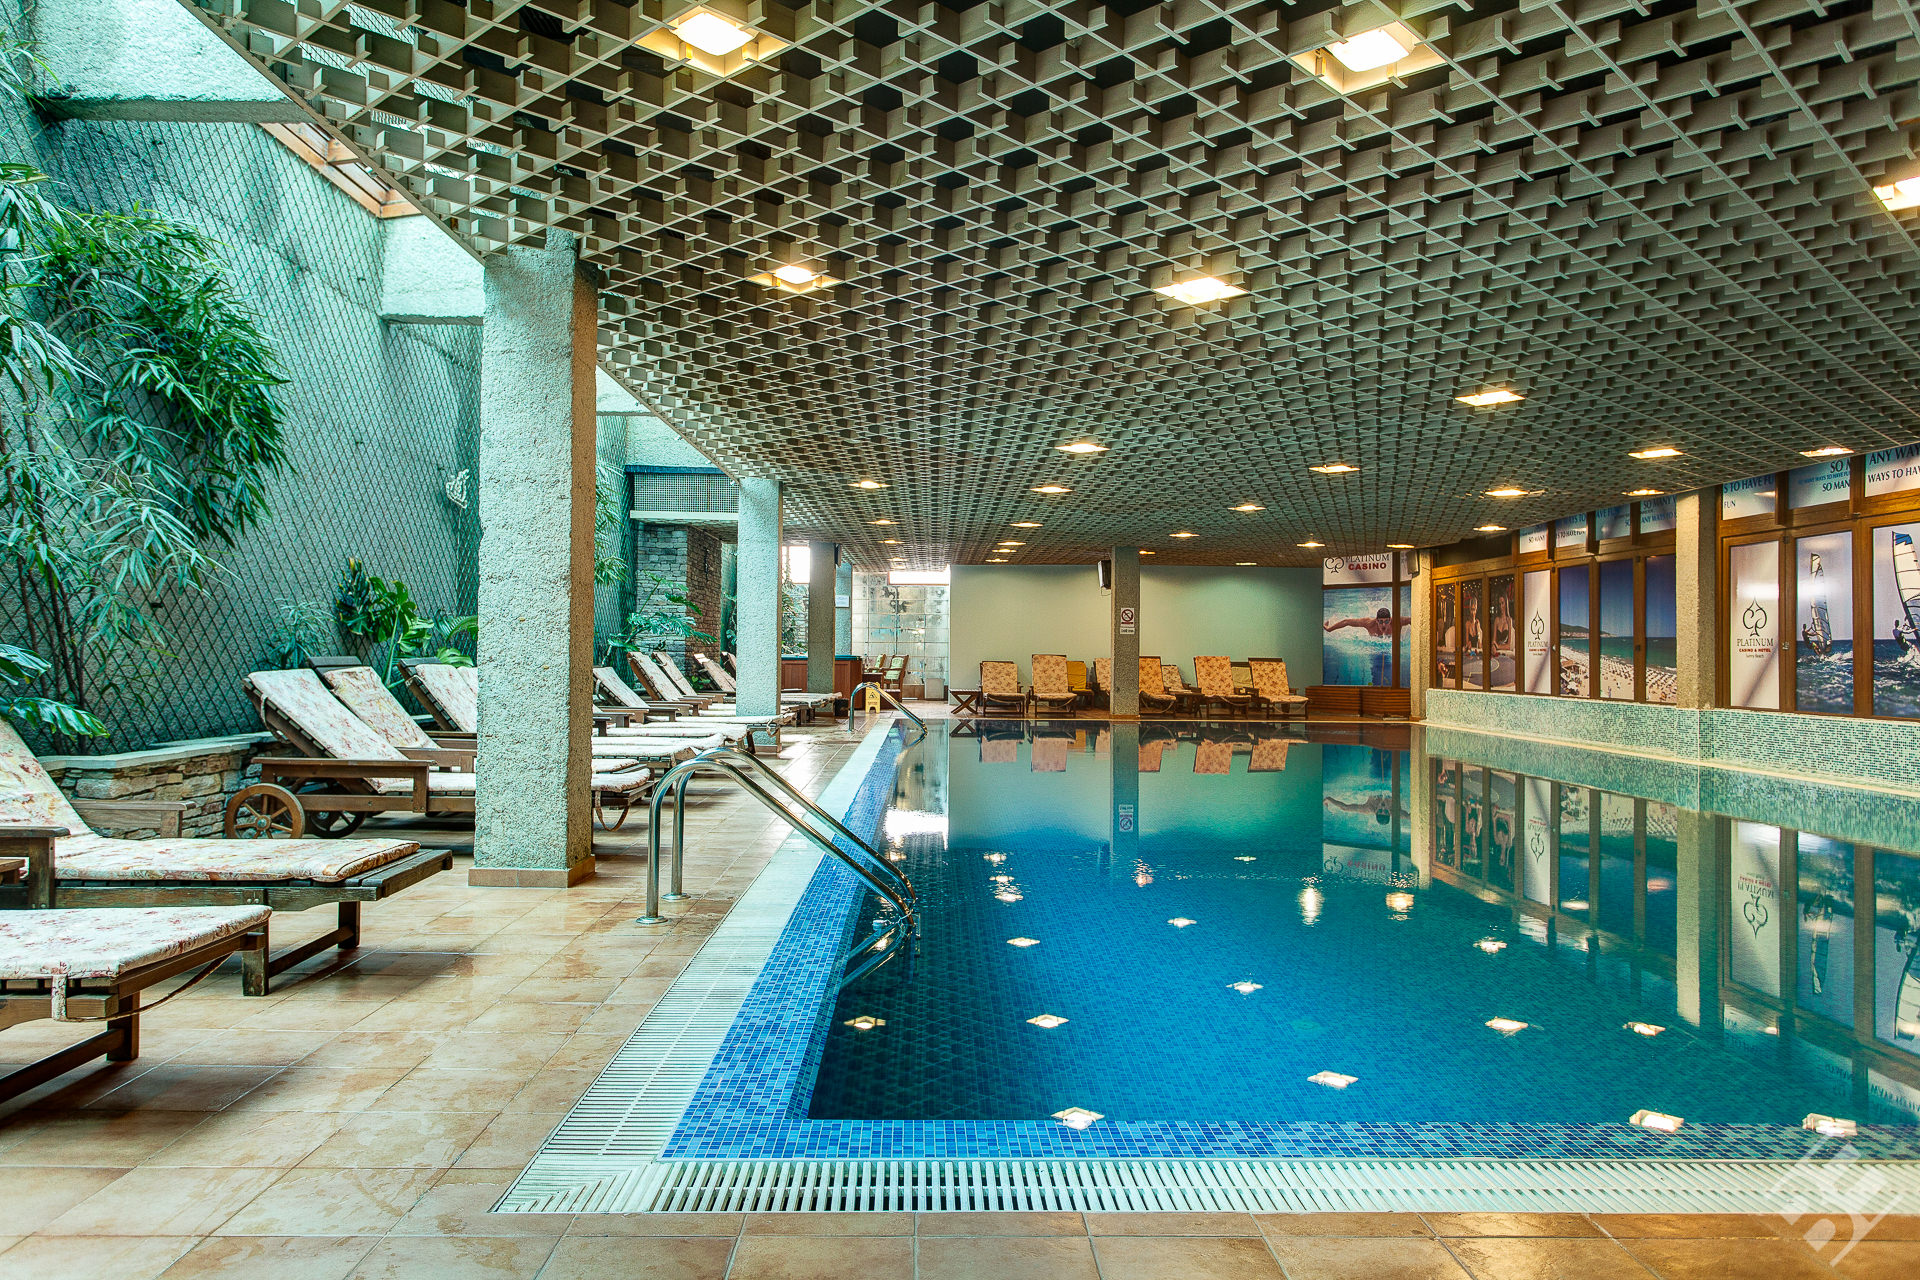 Hotels_13__MG_7118r_Volen_Evtimov